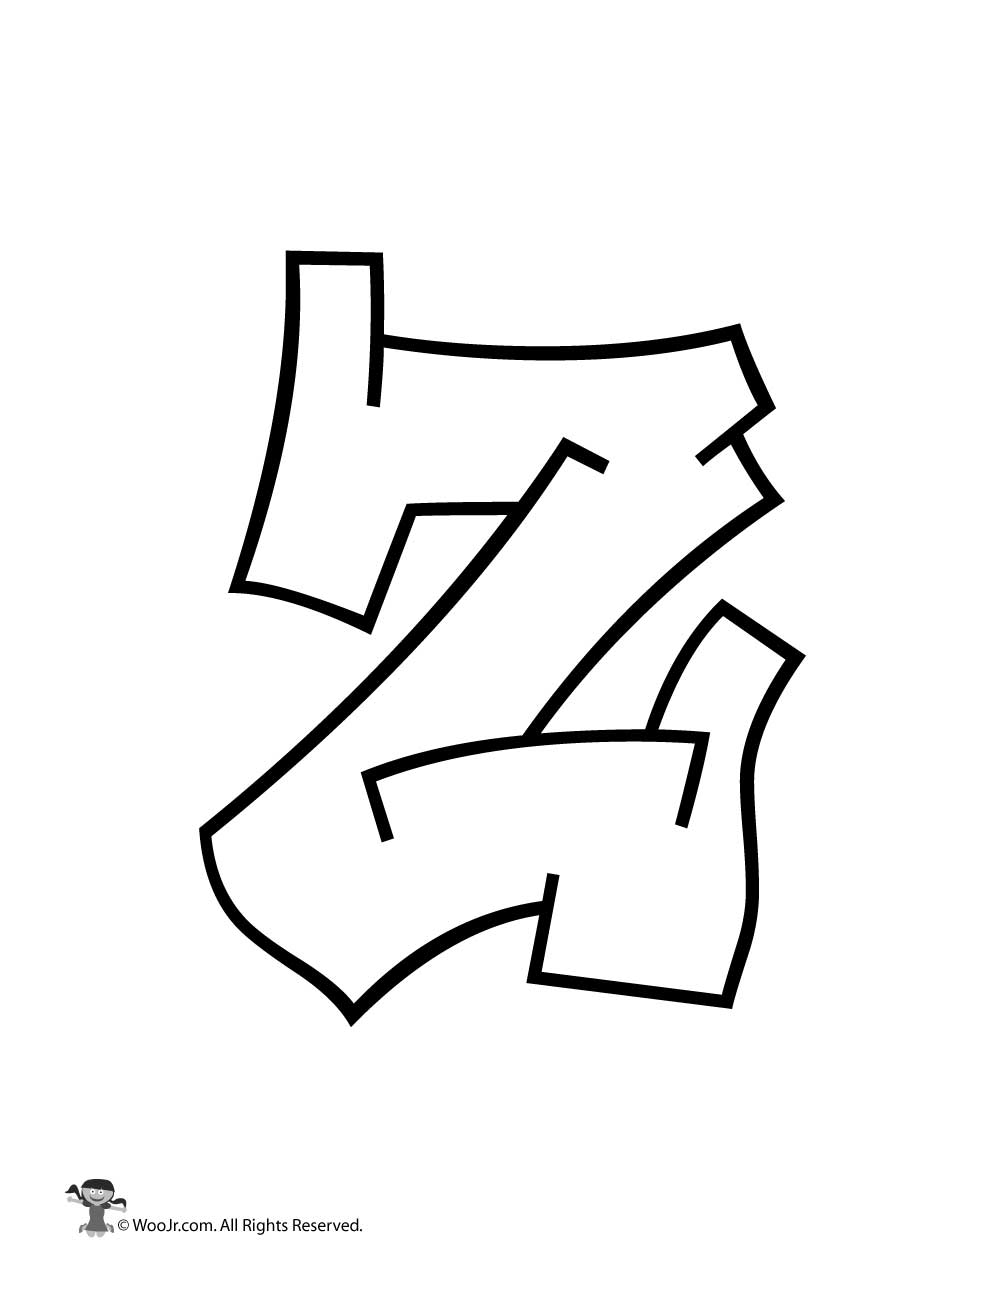 Graffiti Capital Letter Z | Woo! Jr. Kids Activities